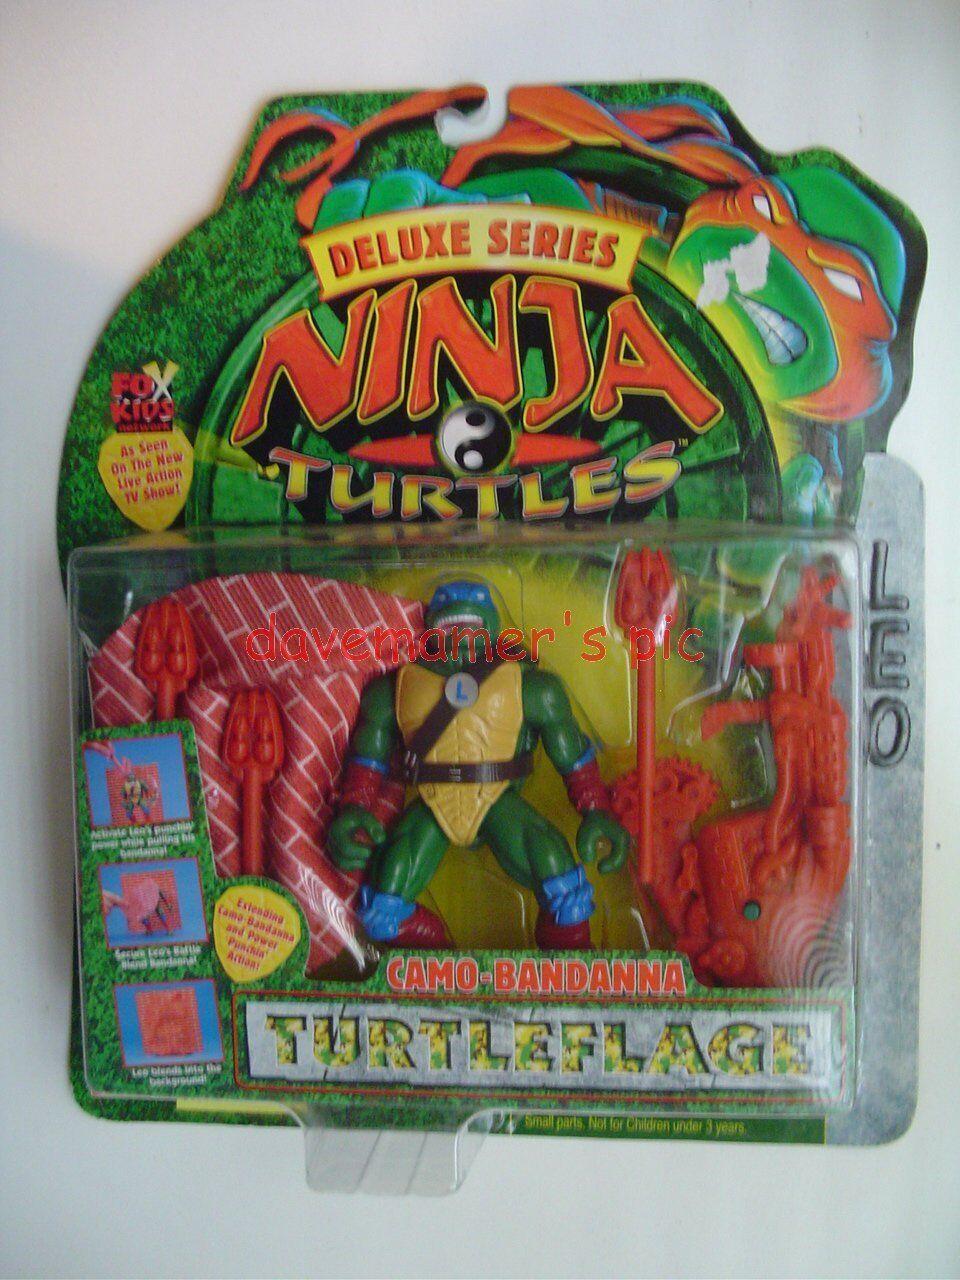 Tmnt Tortugas Ninja Deluxe Series Camo Pañuelo Leo acción figura turtleflage